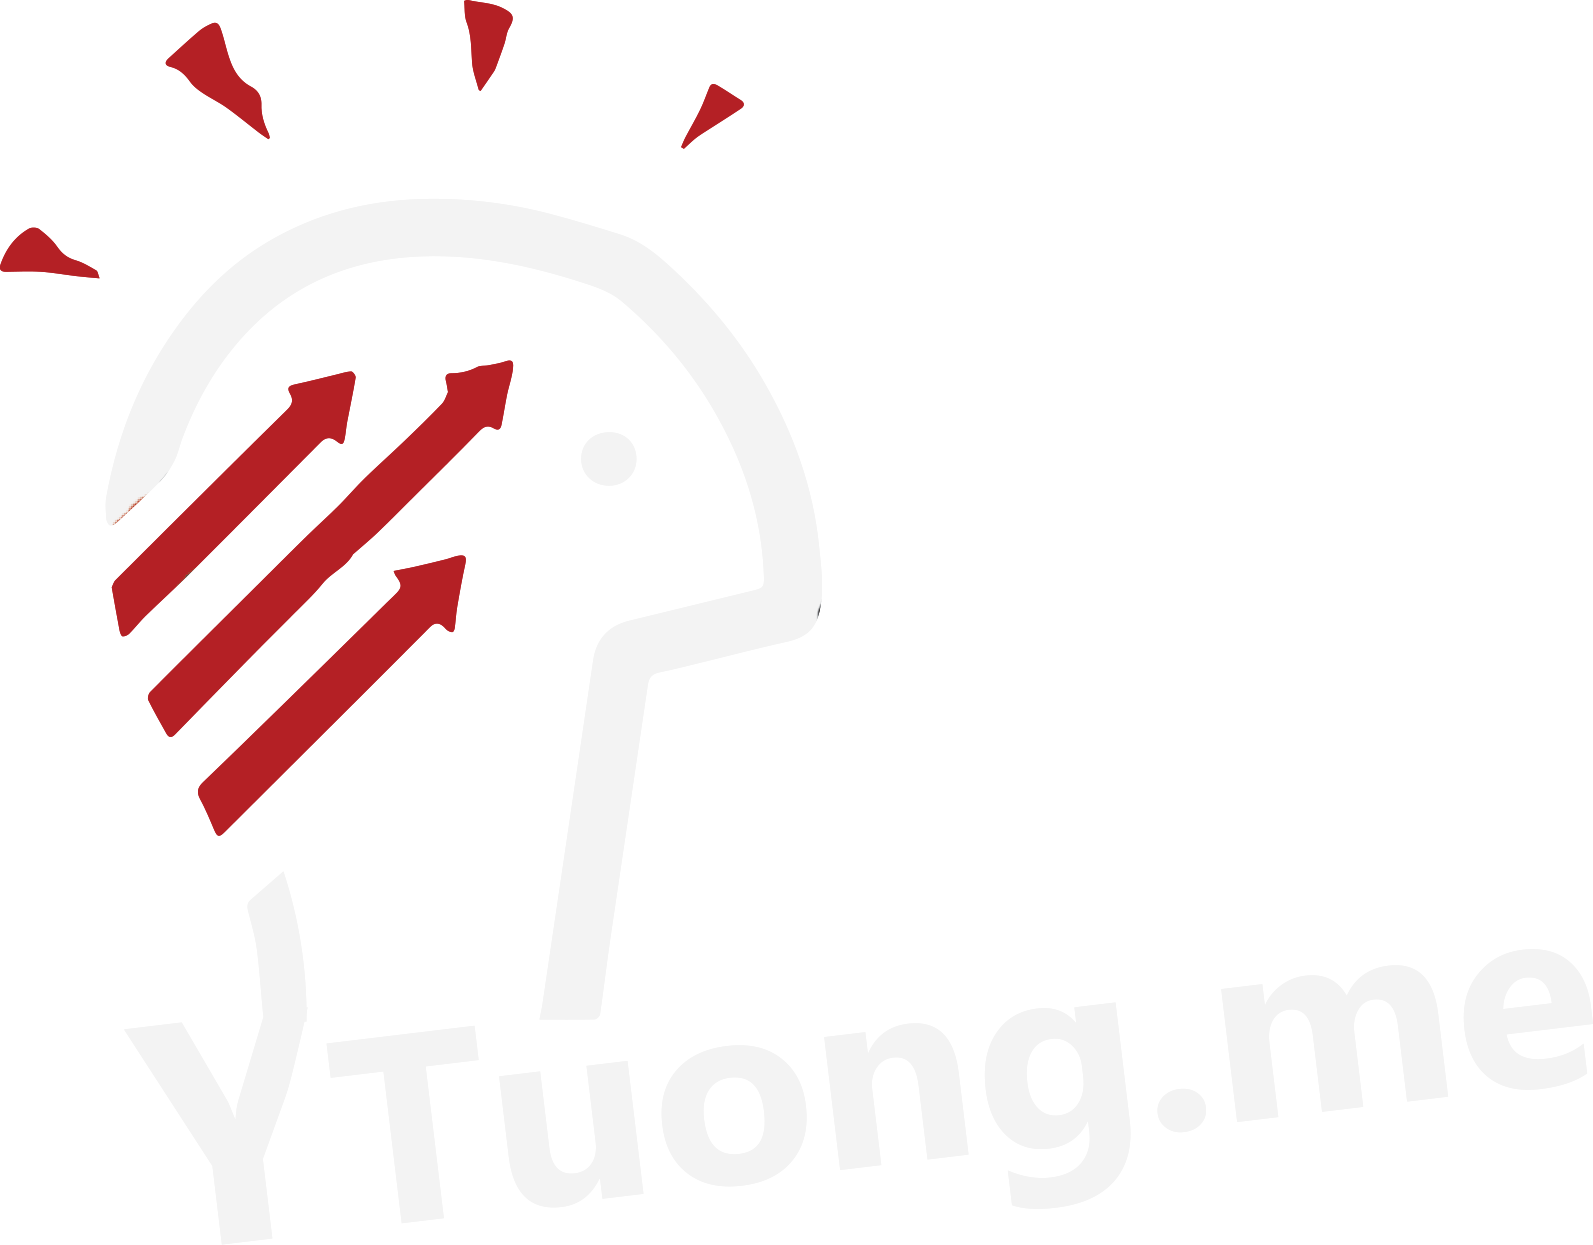 YTuong.me